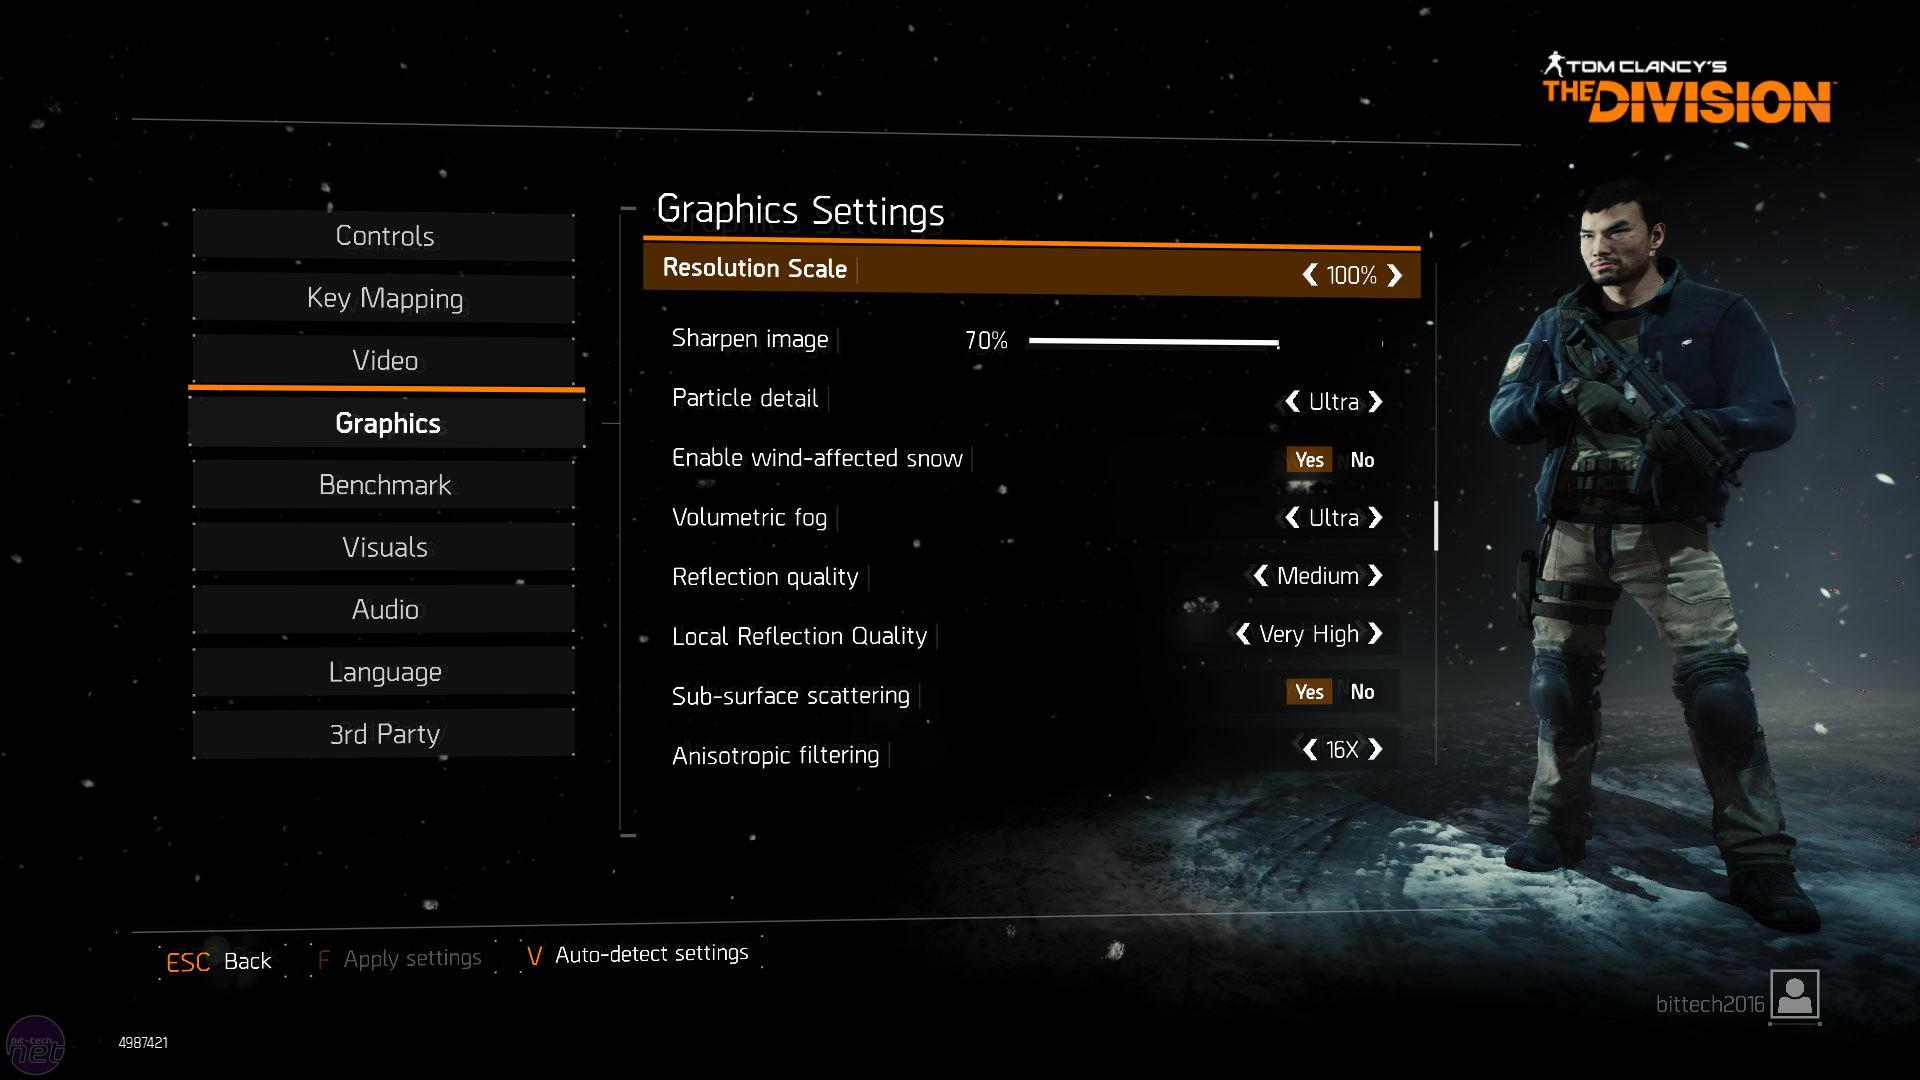 MSI GeForce GTX 1070 Gaming X 8G Review   bit-tech net